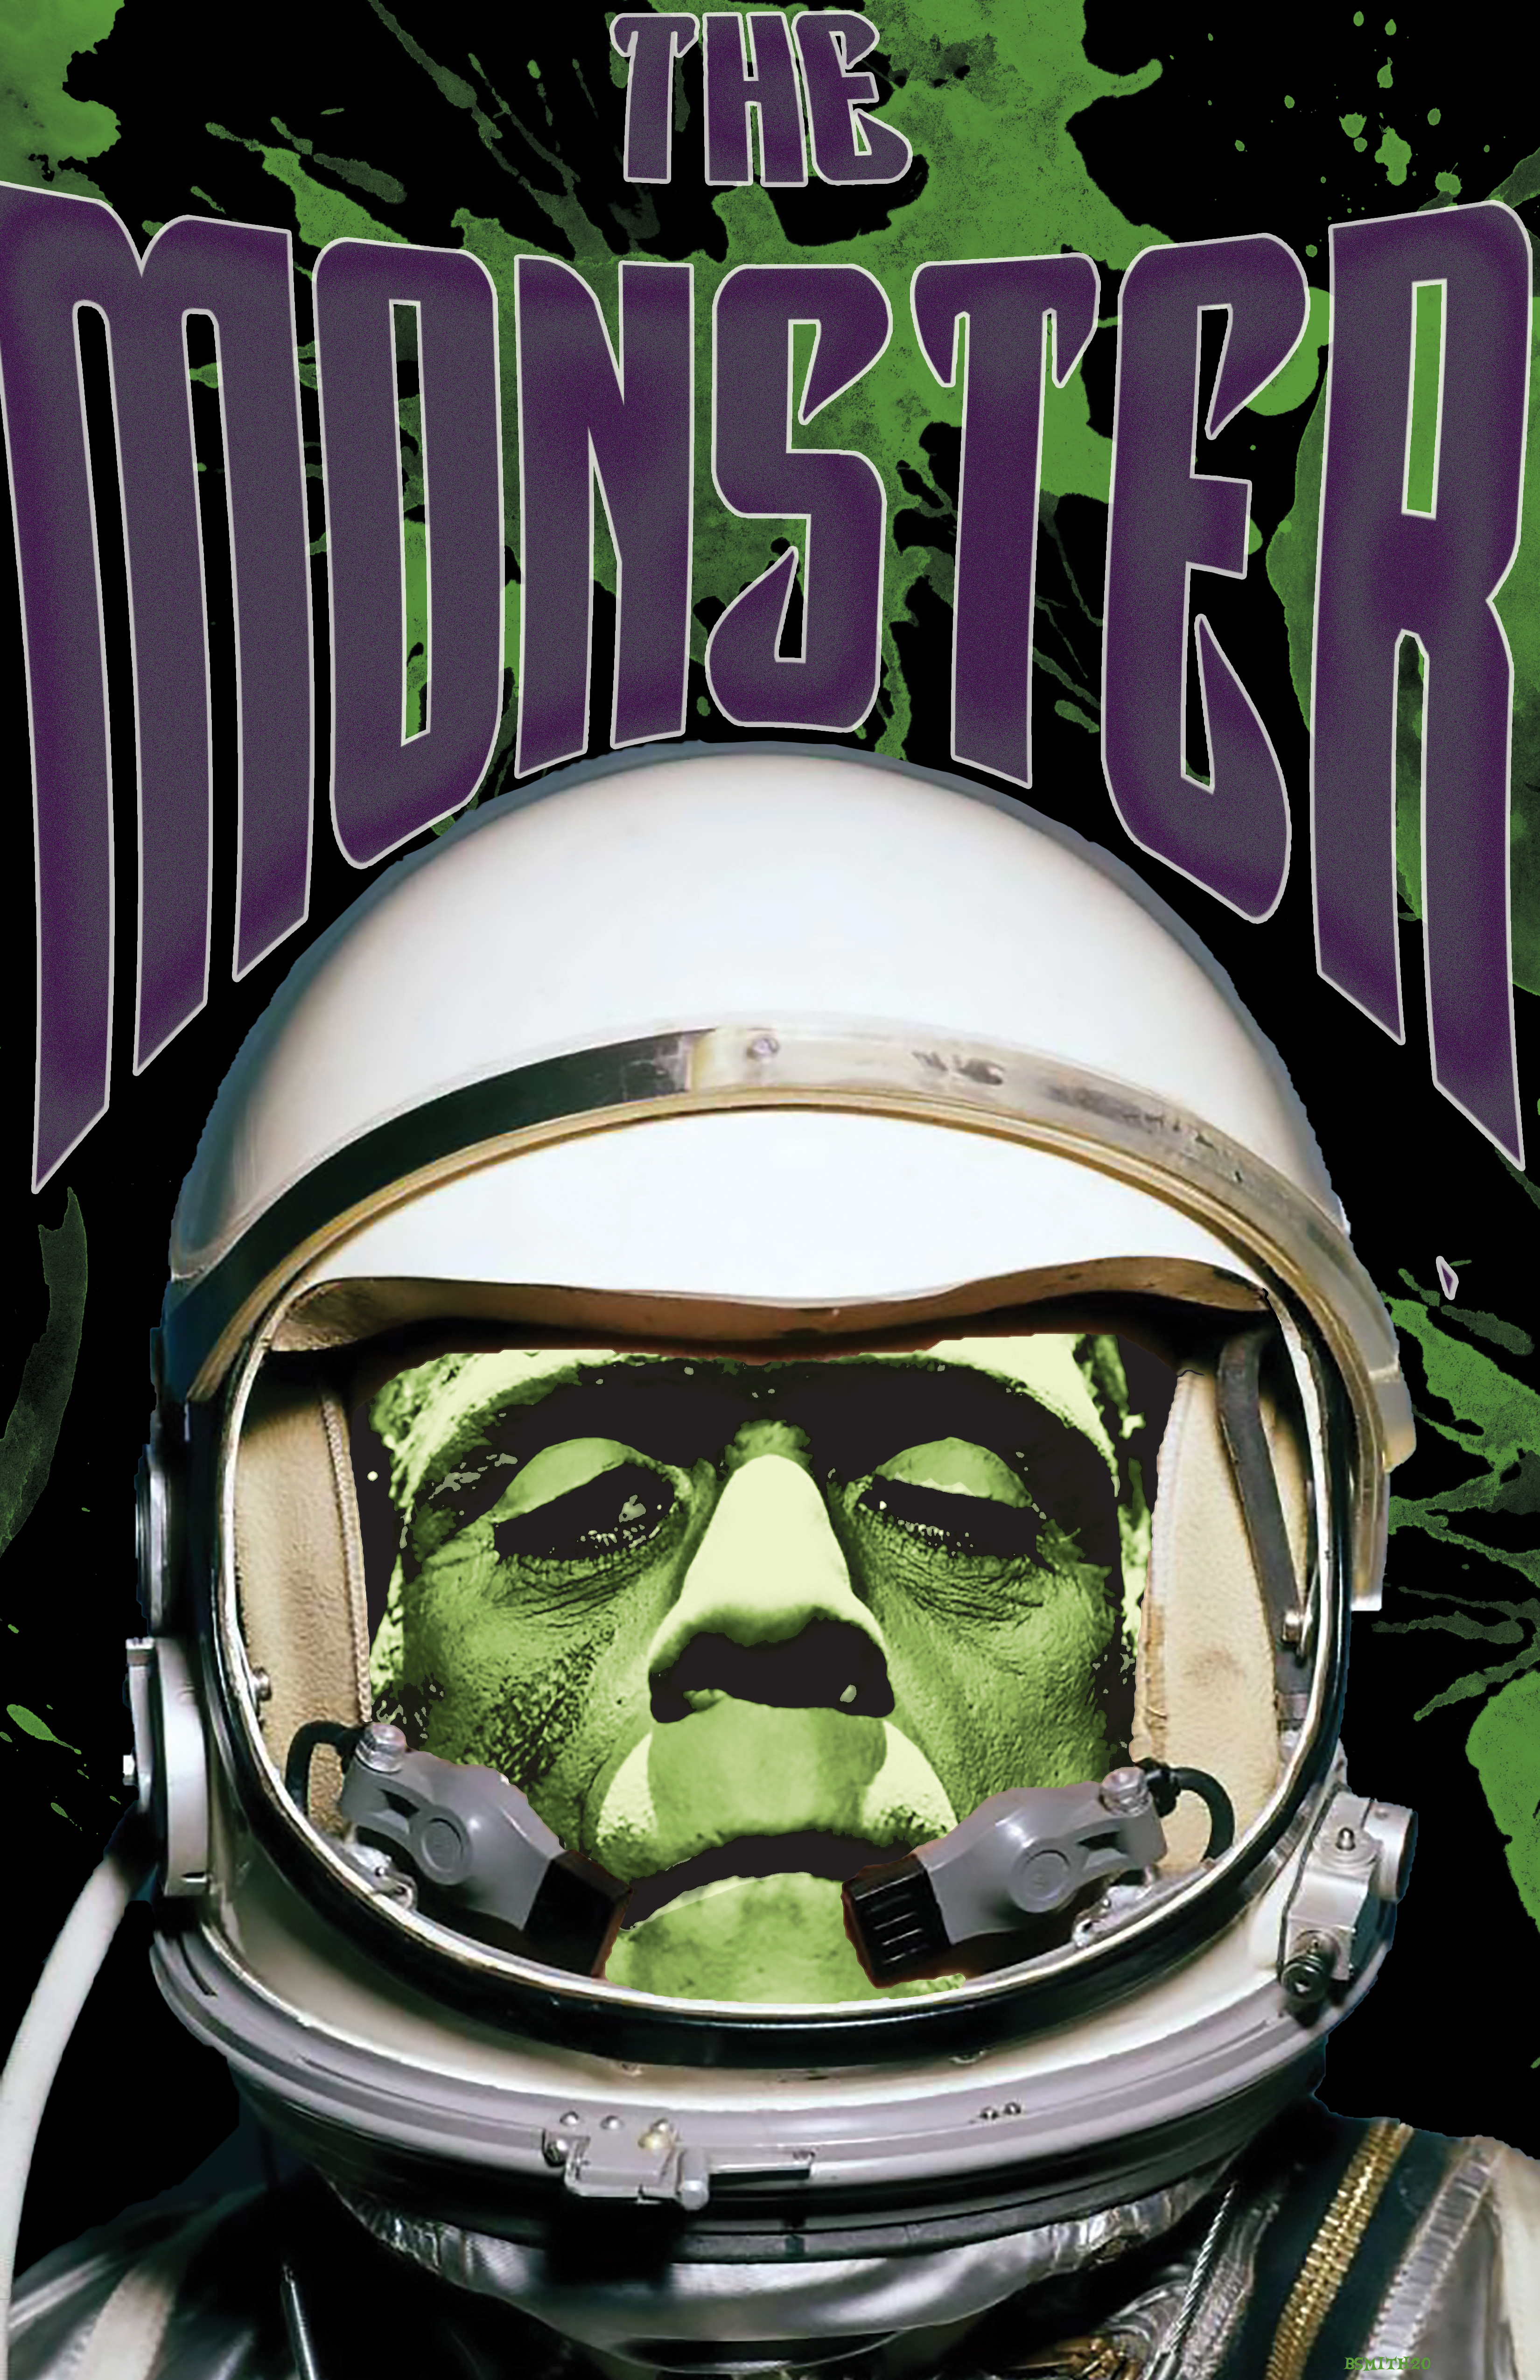 Frankenstein Astro Zombie